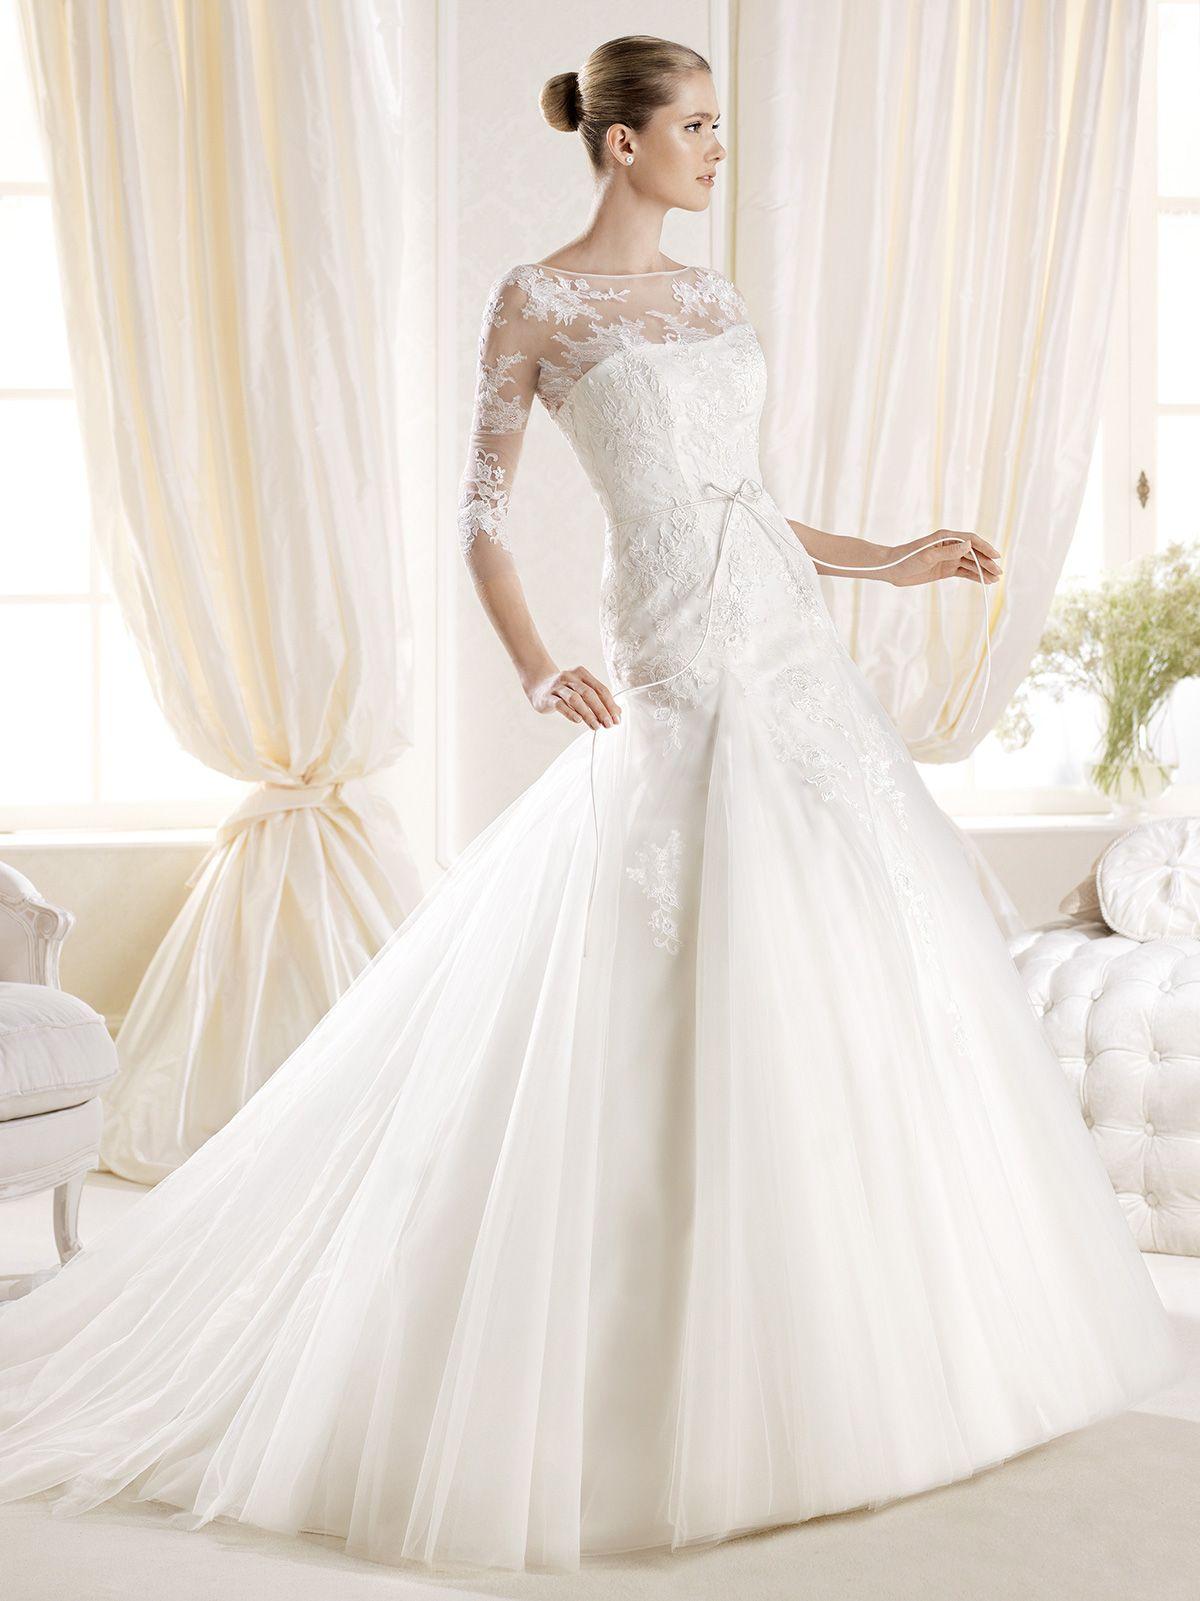 Three Quarter Sleeve Wedding Dress | WEDDING DRESS TREND | Pinterest ...